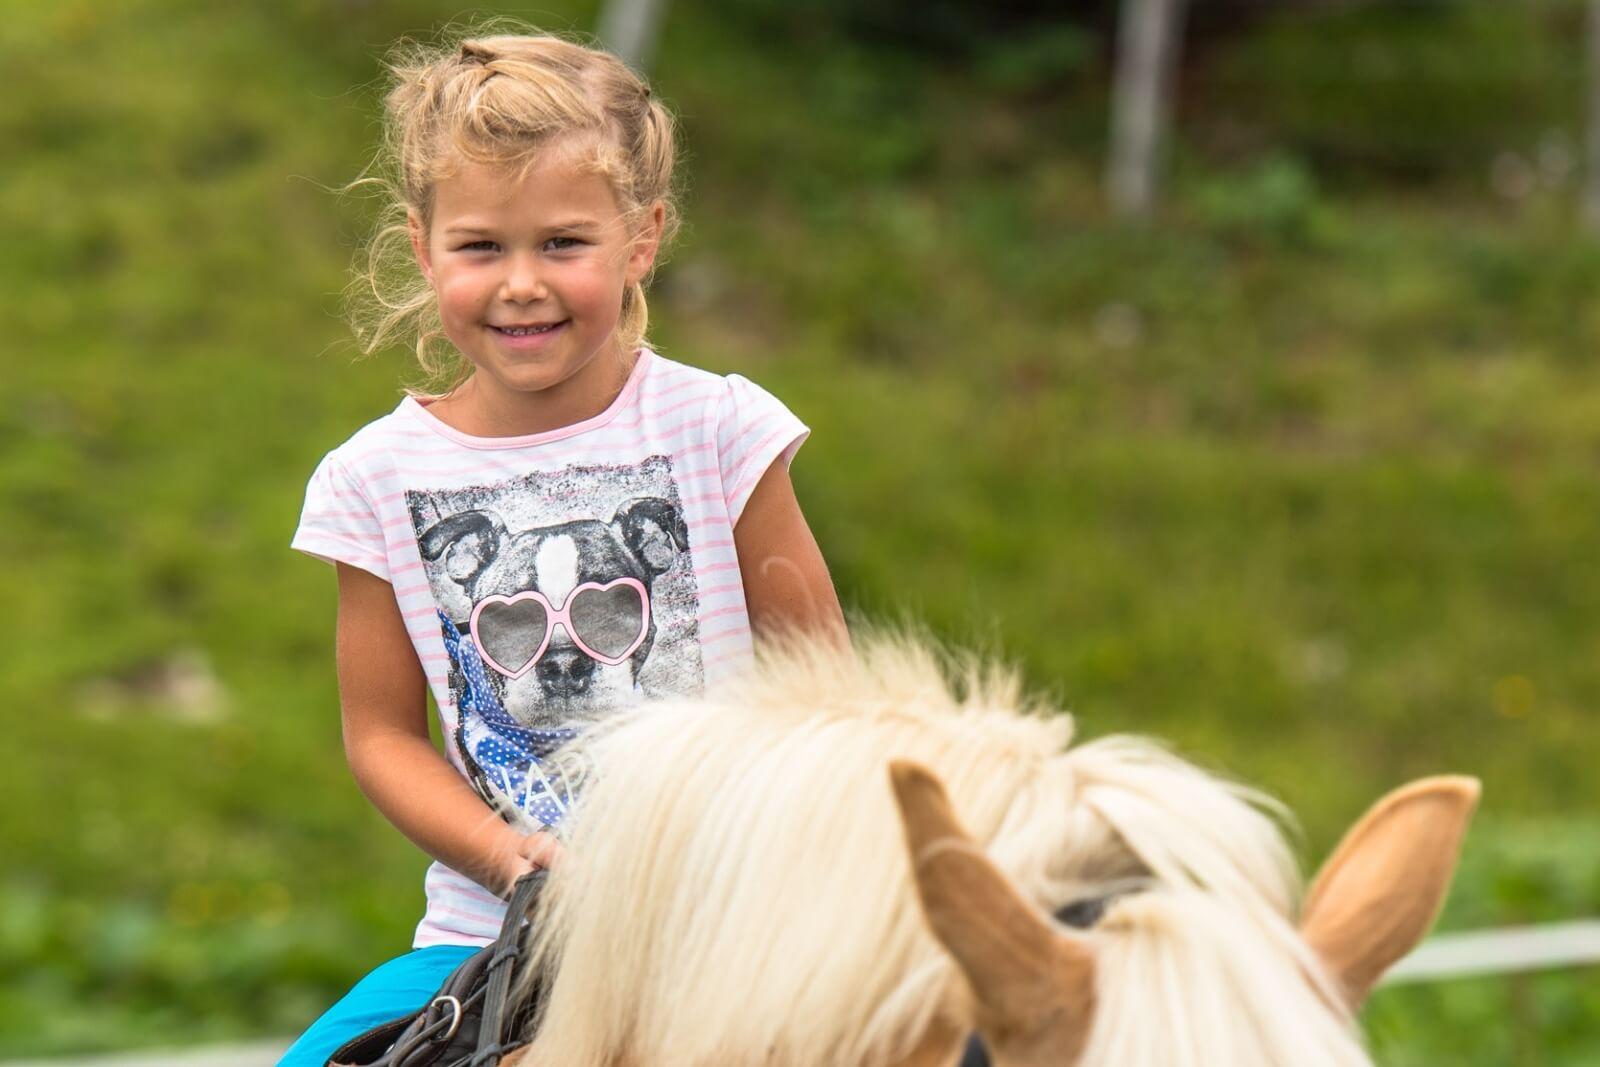 Heidi-Chalet-Falkert-Heidialm-Falkertsee-Reiten-Kinder-Alm-Pony